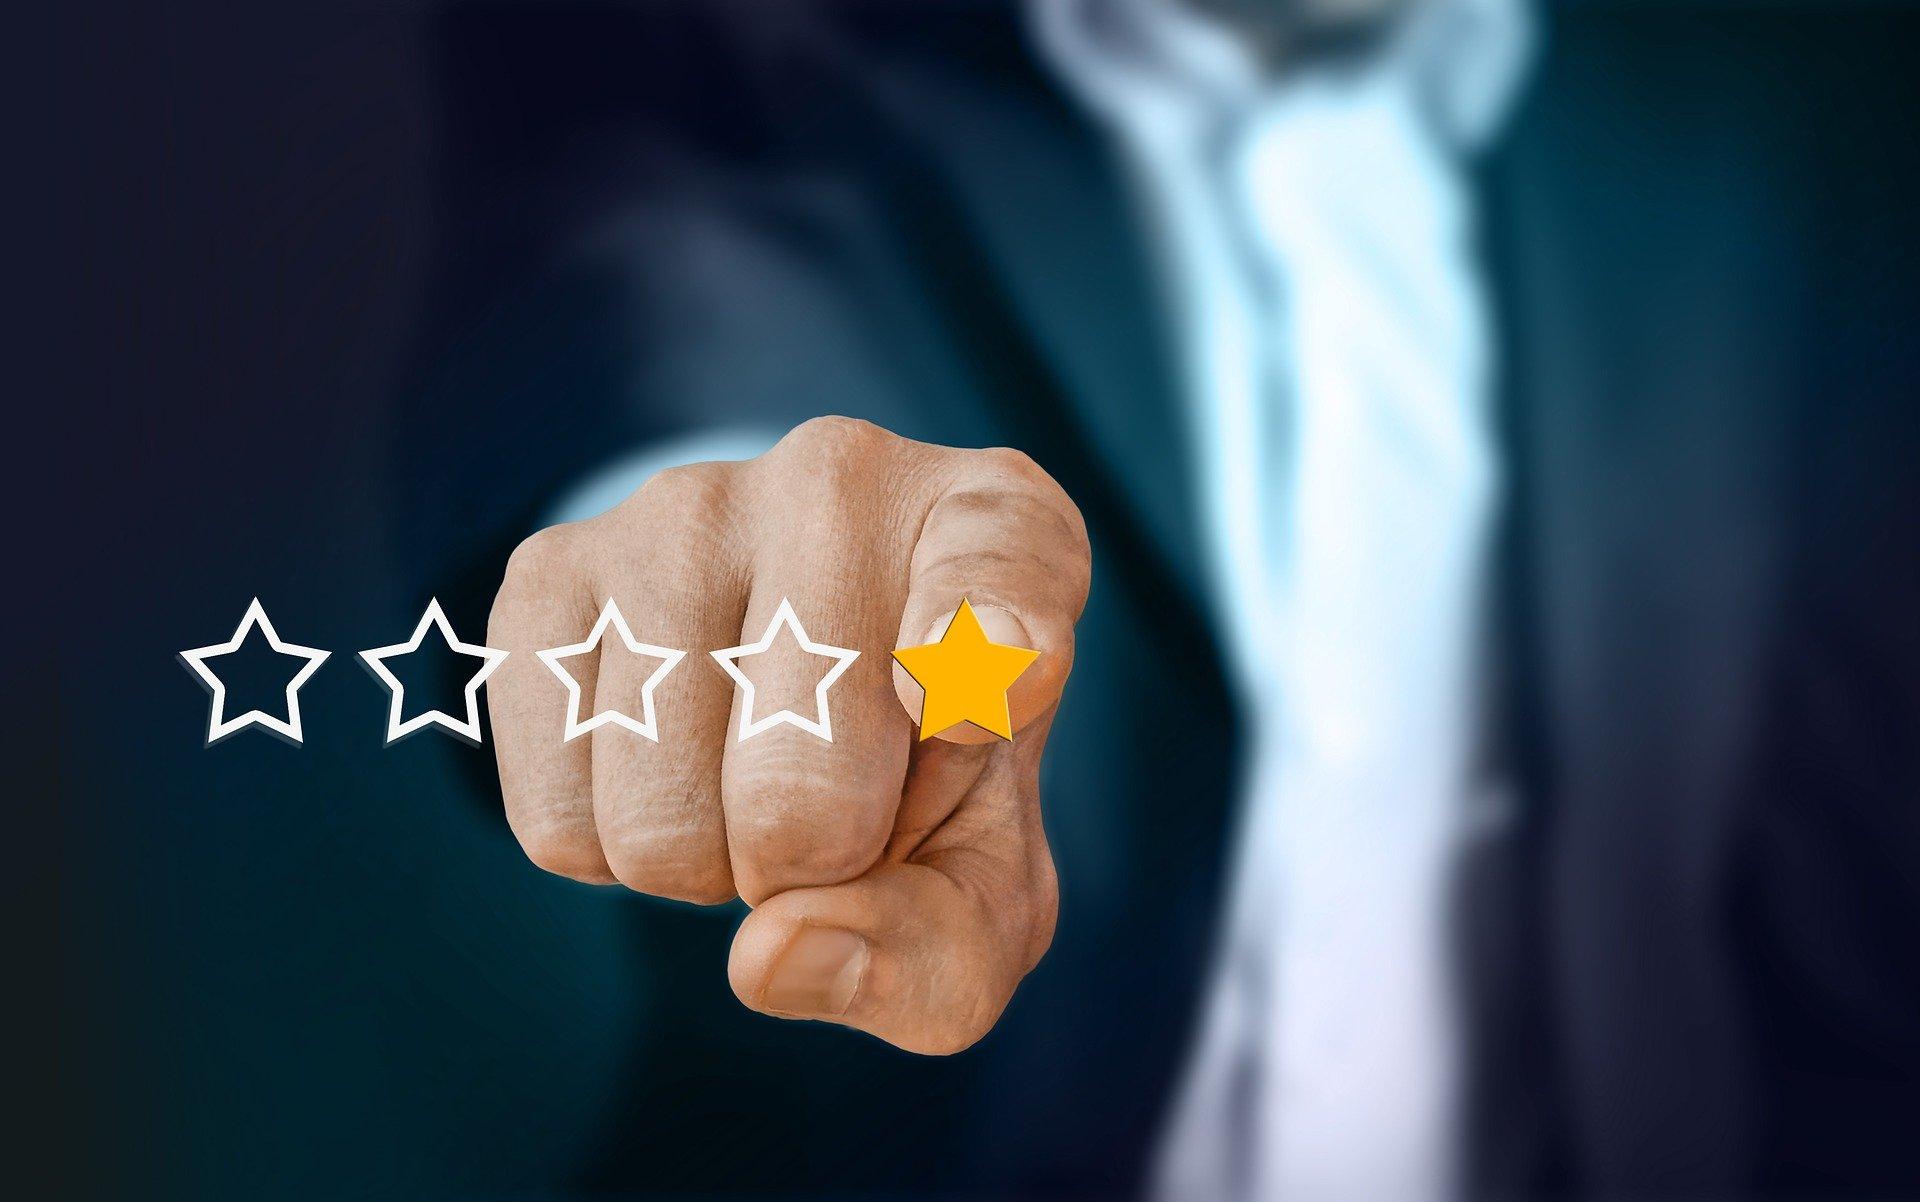 irestore, customer reviews, restoration management, restoration management software